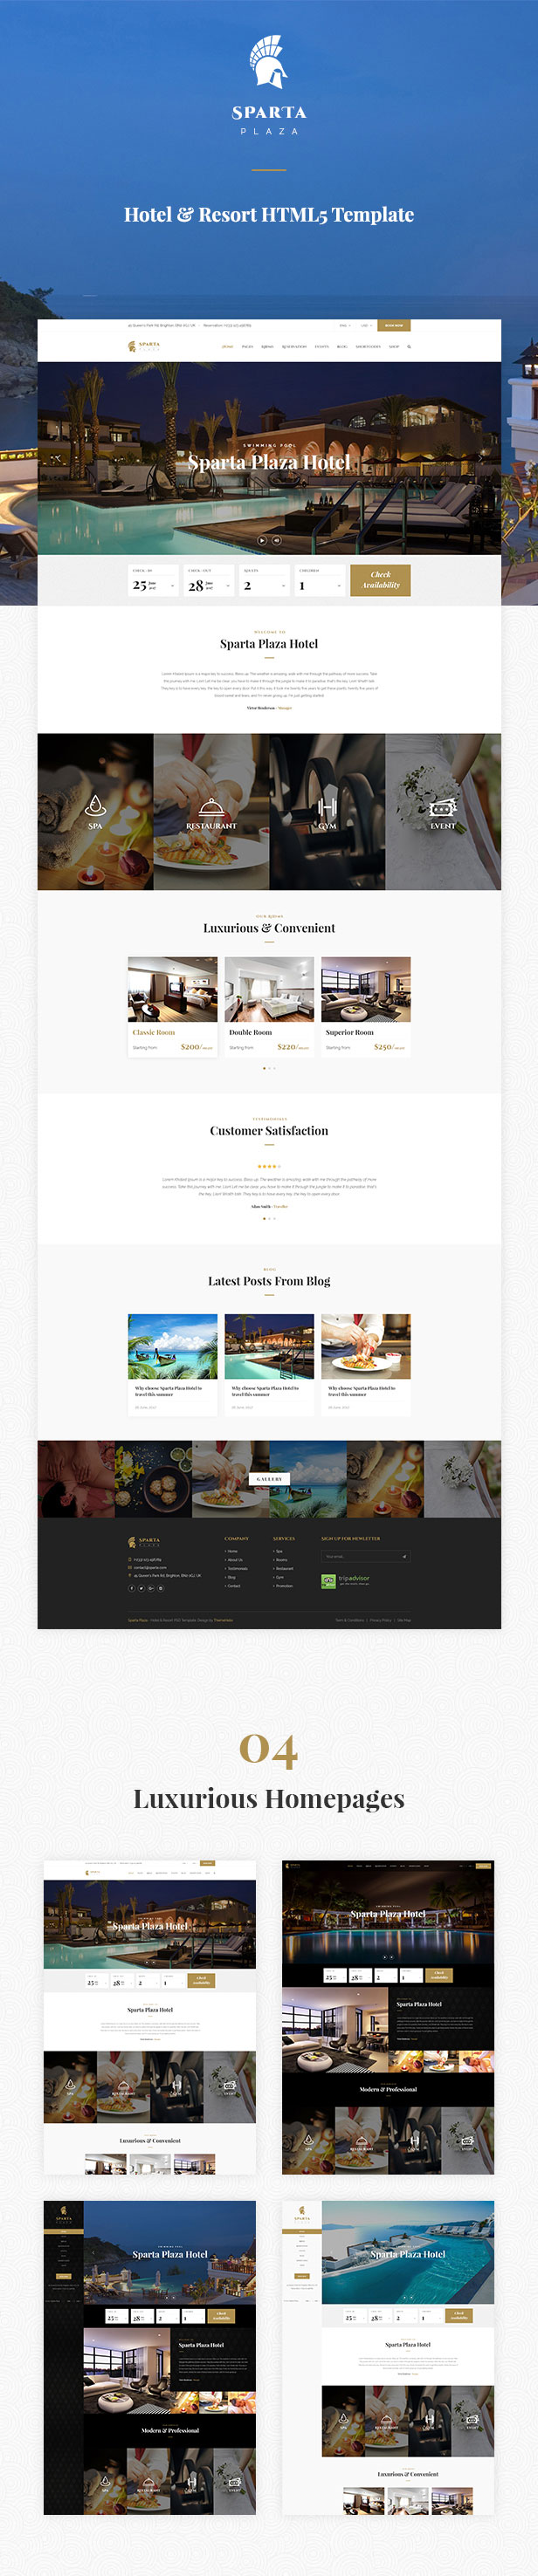 Sparta   Hotel & Resort HTML5 Template - 5